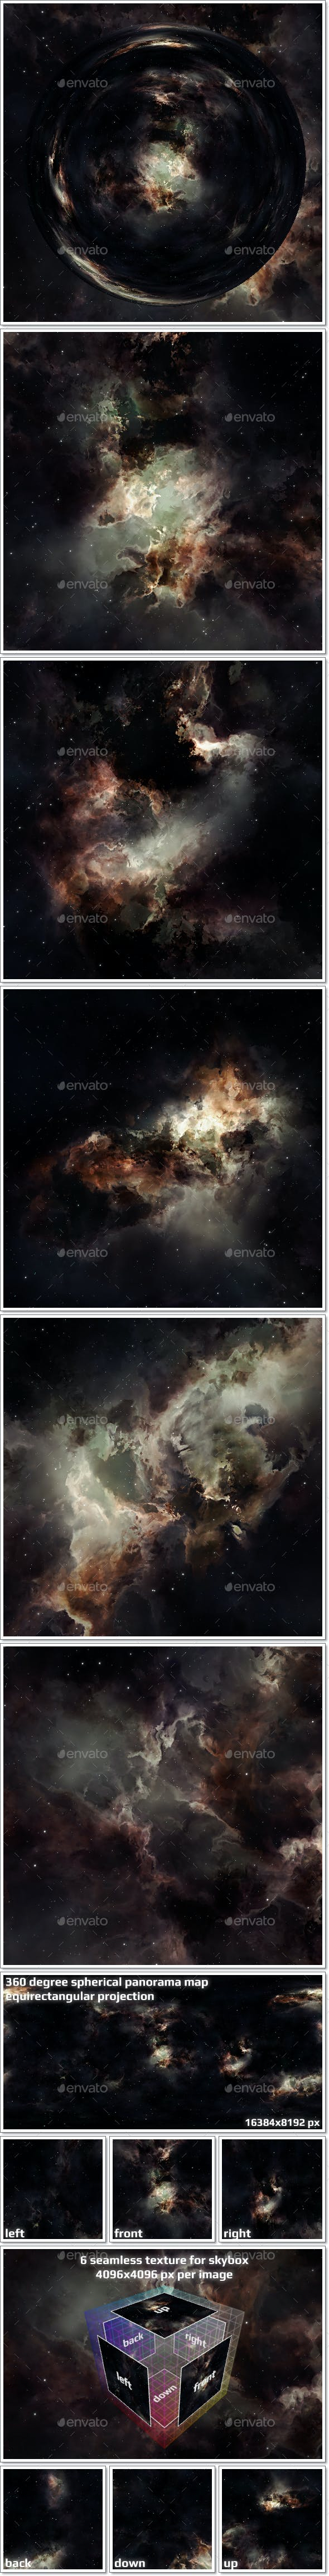 Nebula Space Environment HDRI Map 021 - 3DOcean Item for Sale